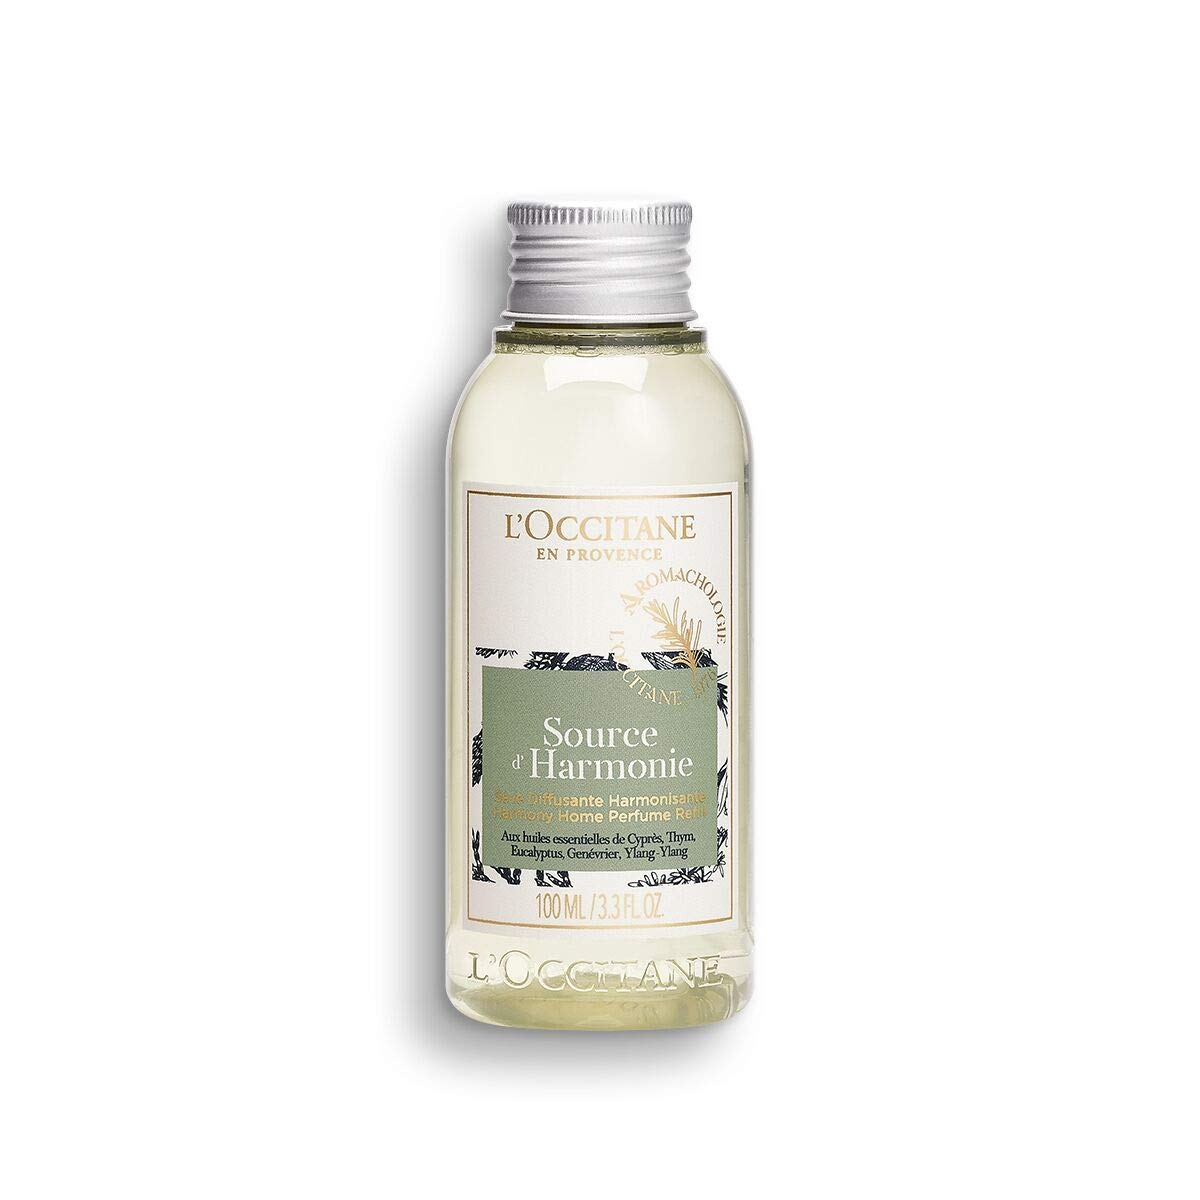 L'Occitane Source d'Harmonie Harmony Home Perfume Refill 3.30 fl. oz